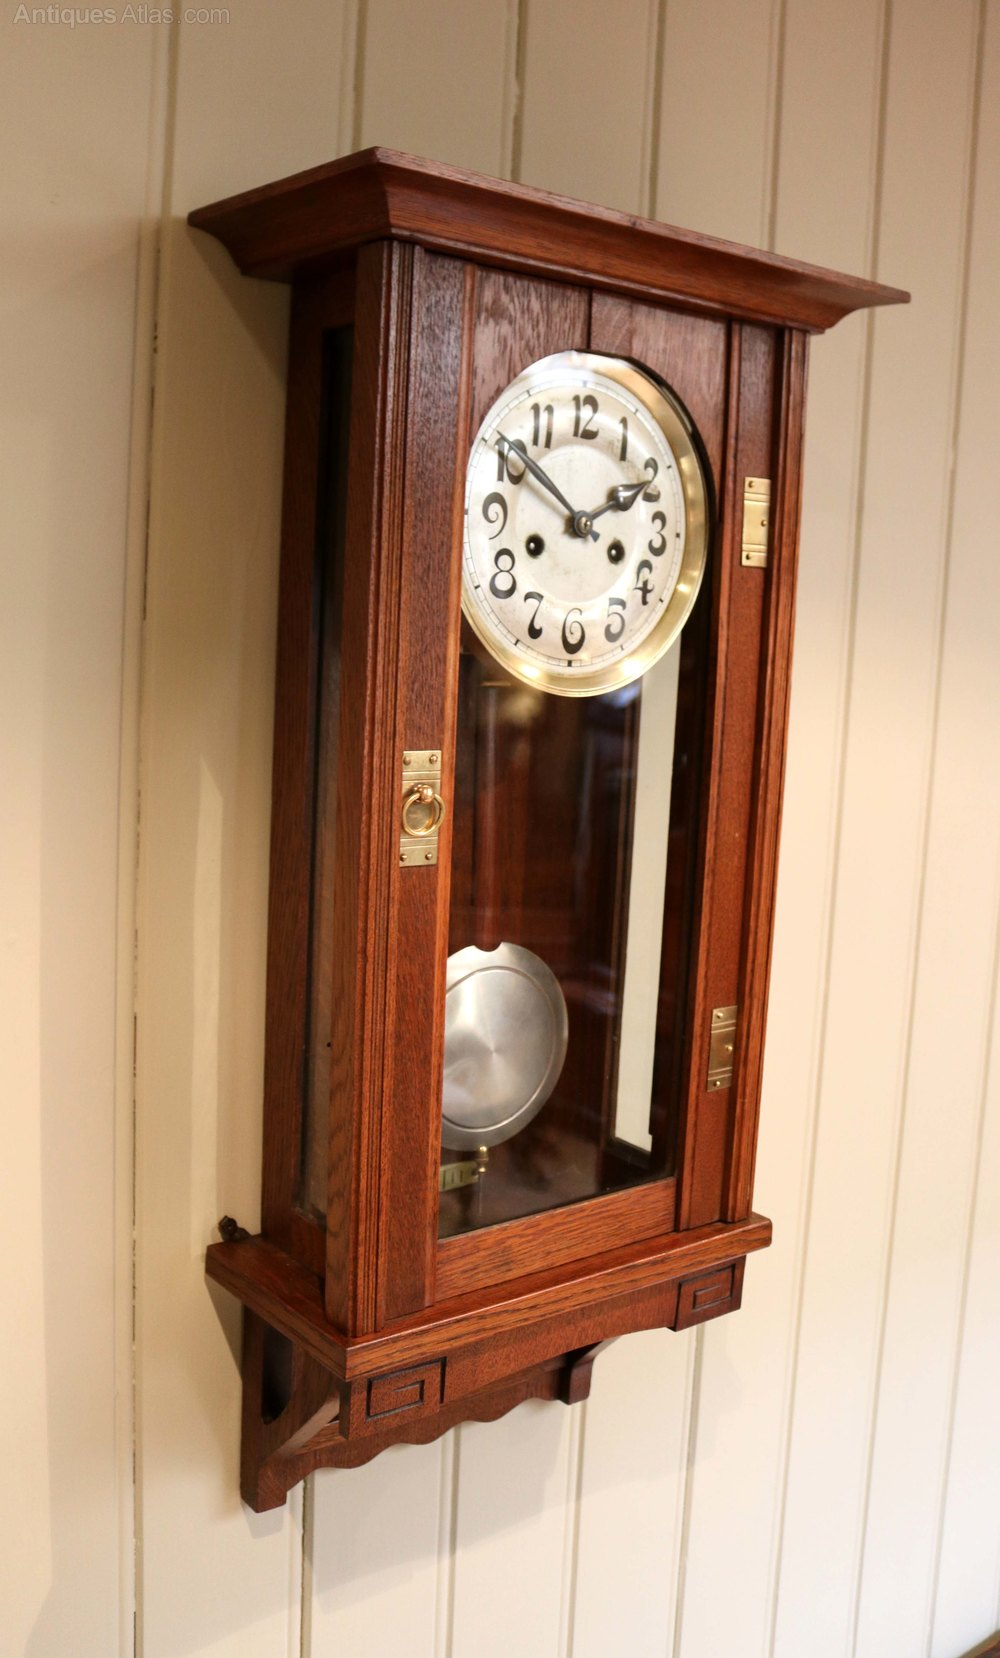 Antiques atlas oak arts and crafts striking wall clock for Arts and crafts style wall clock